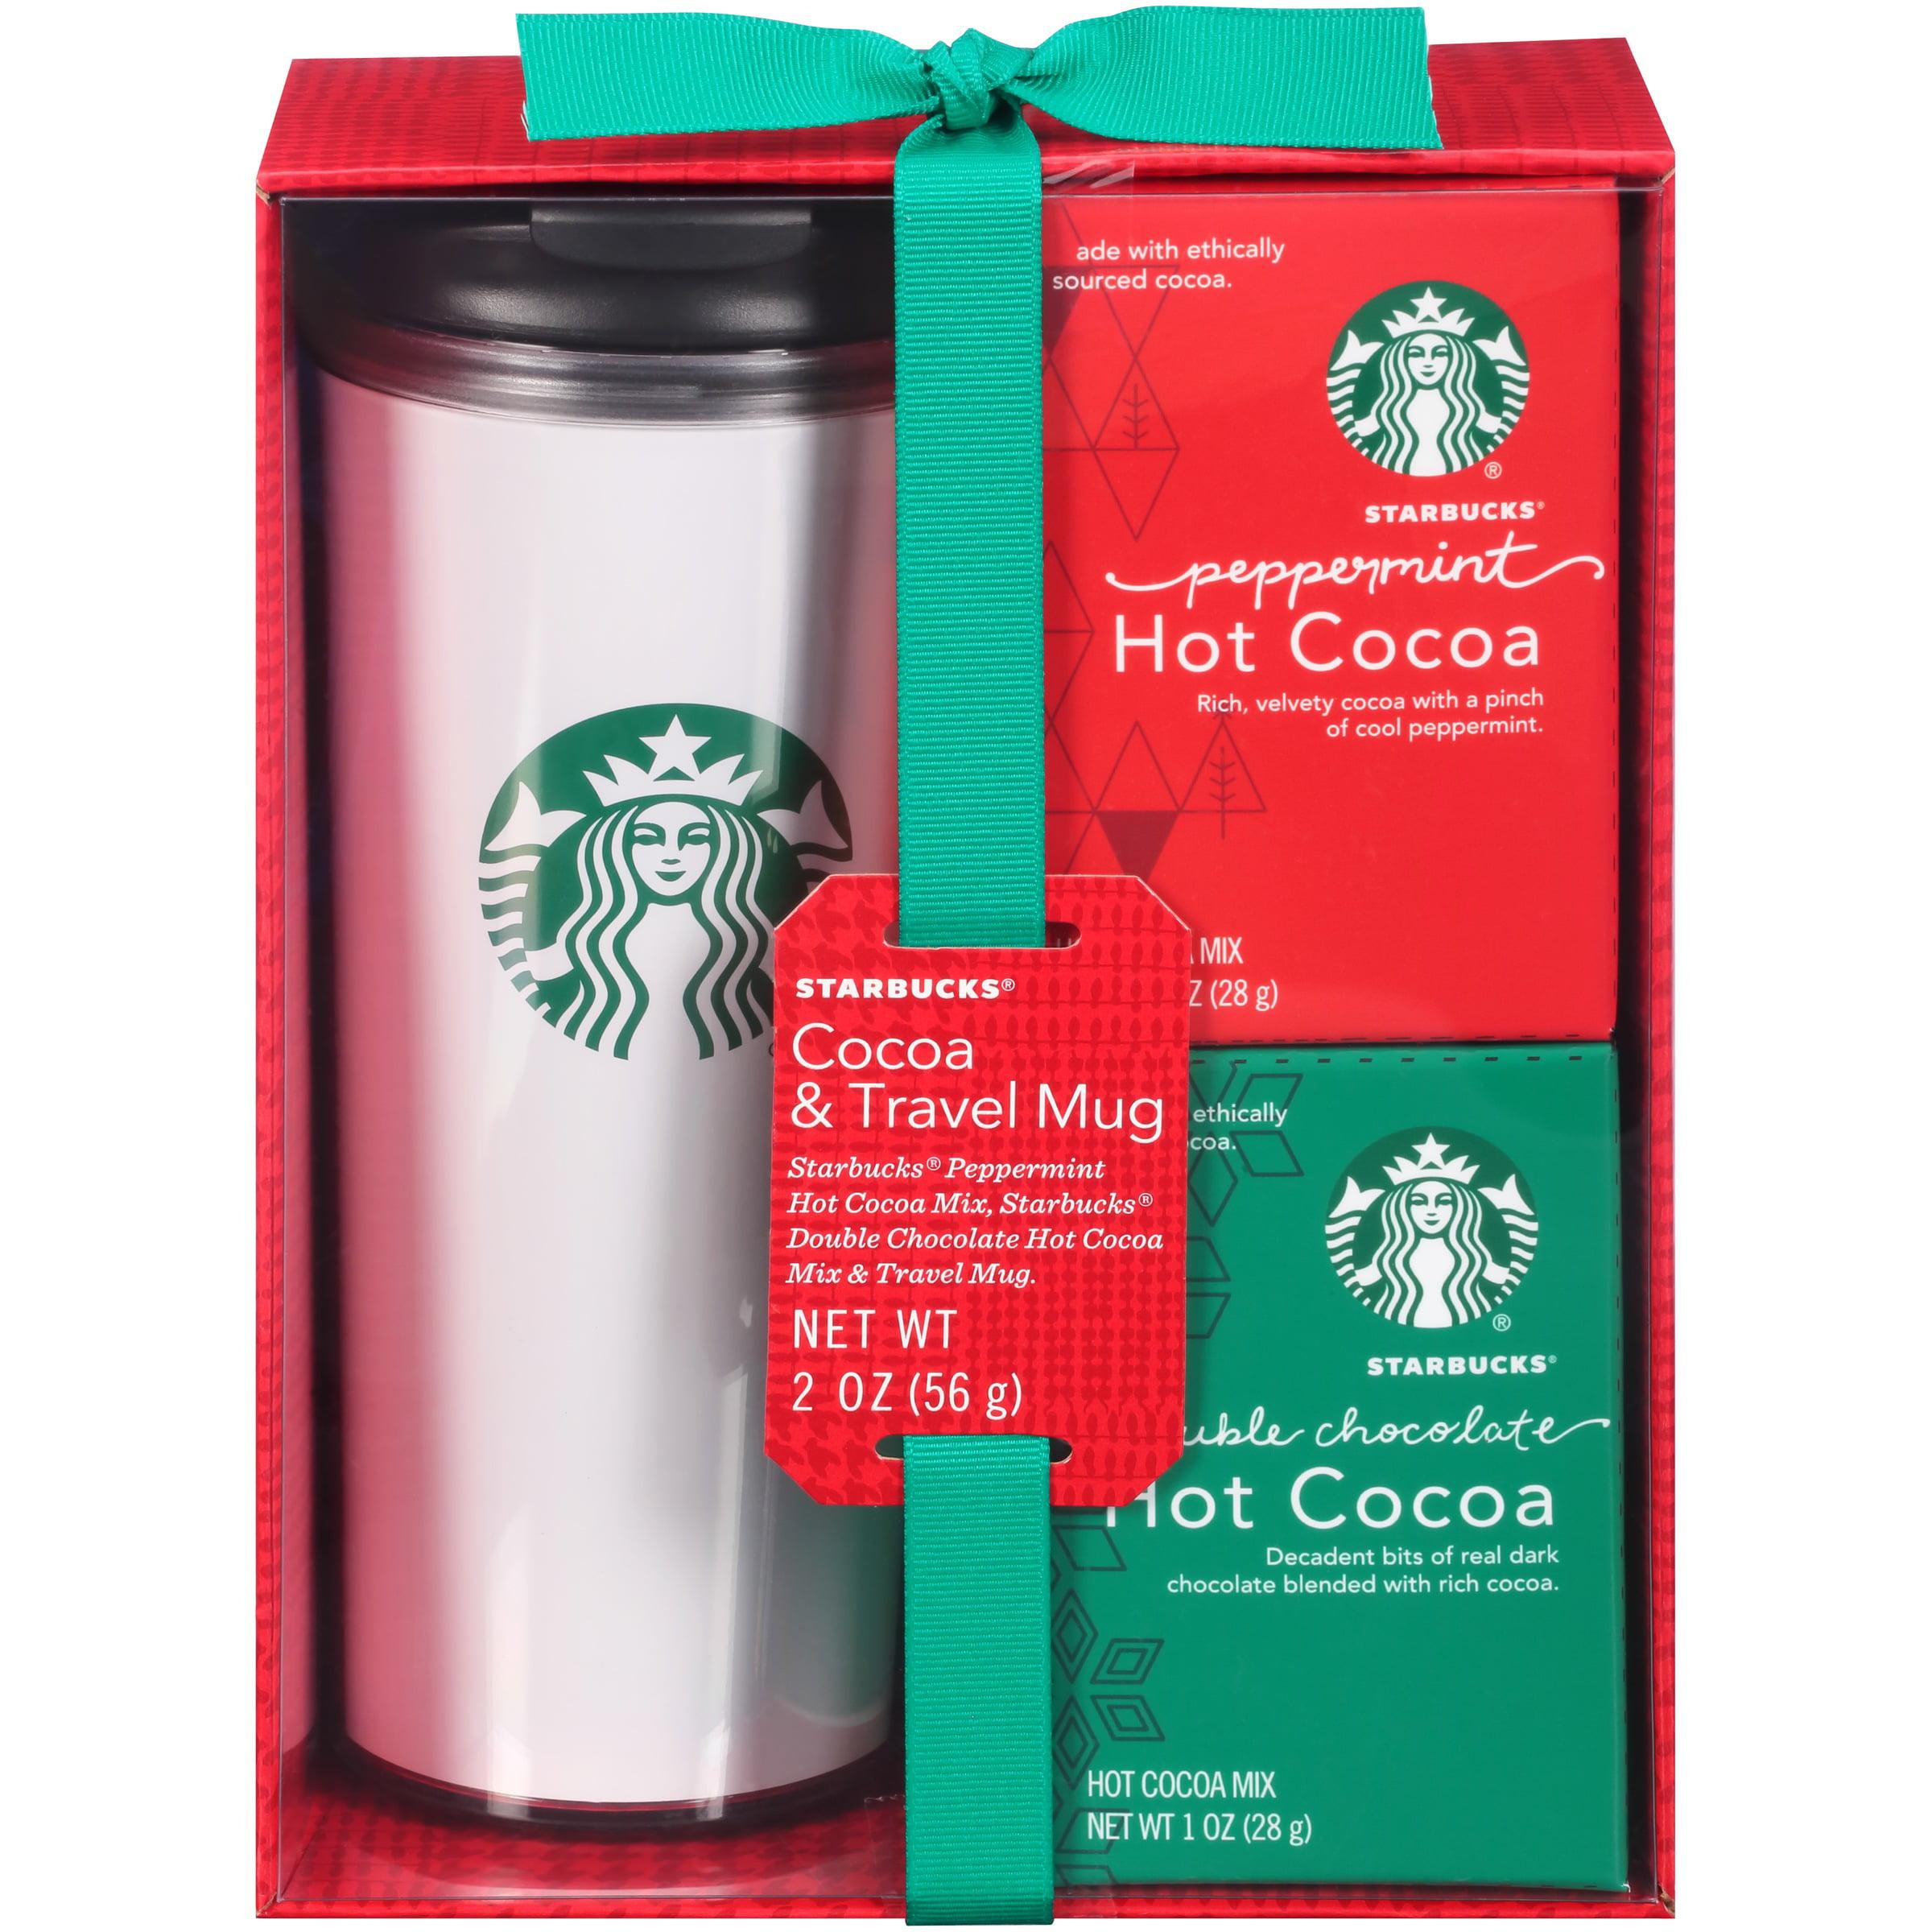 Starbucks 174 Cocoa Amp Travel Mug Holiday Gift Set 3 Pc Box